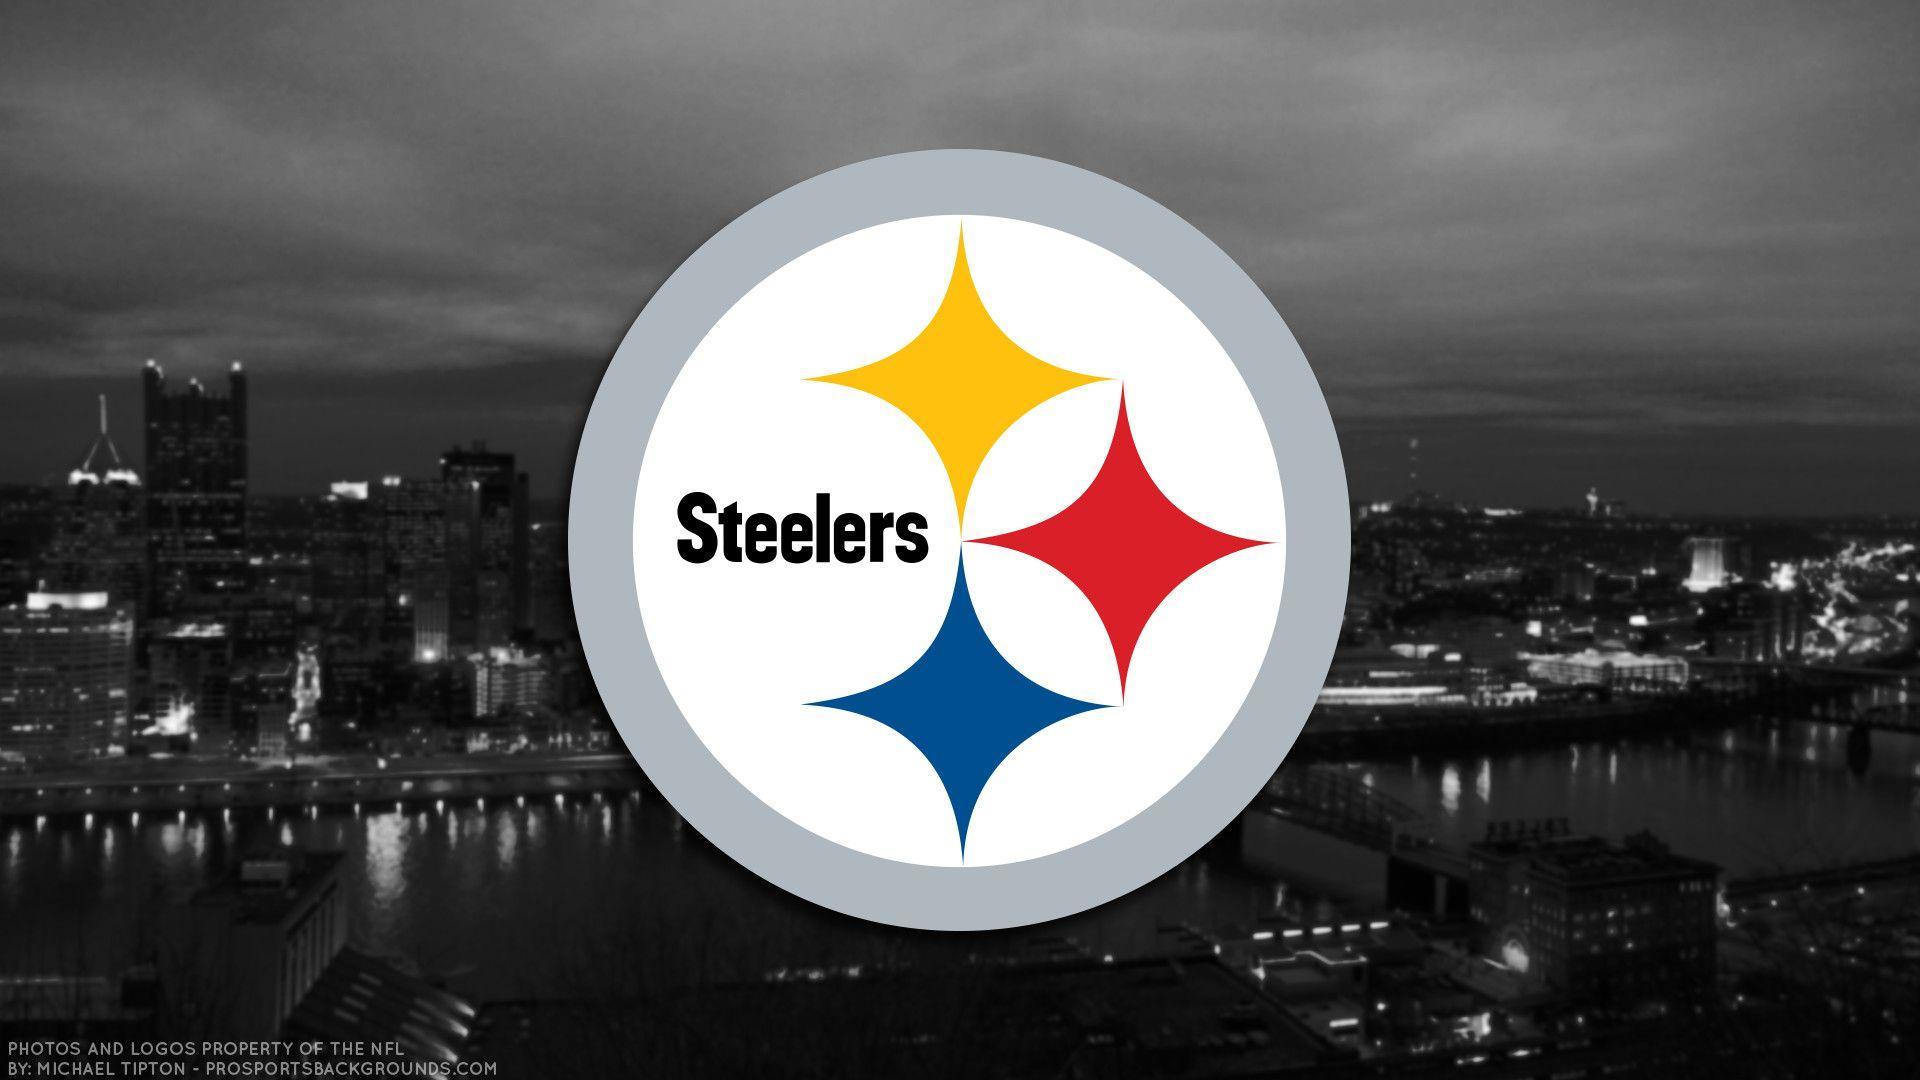 Pittsburgh Steelers Wallpapers Top Free Pittsburgh Steelers Backgrounds Wallpaperaccess